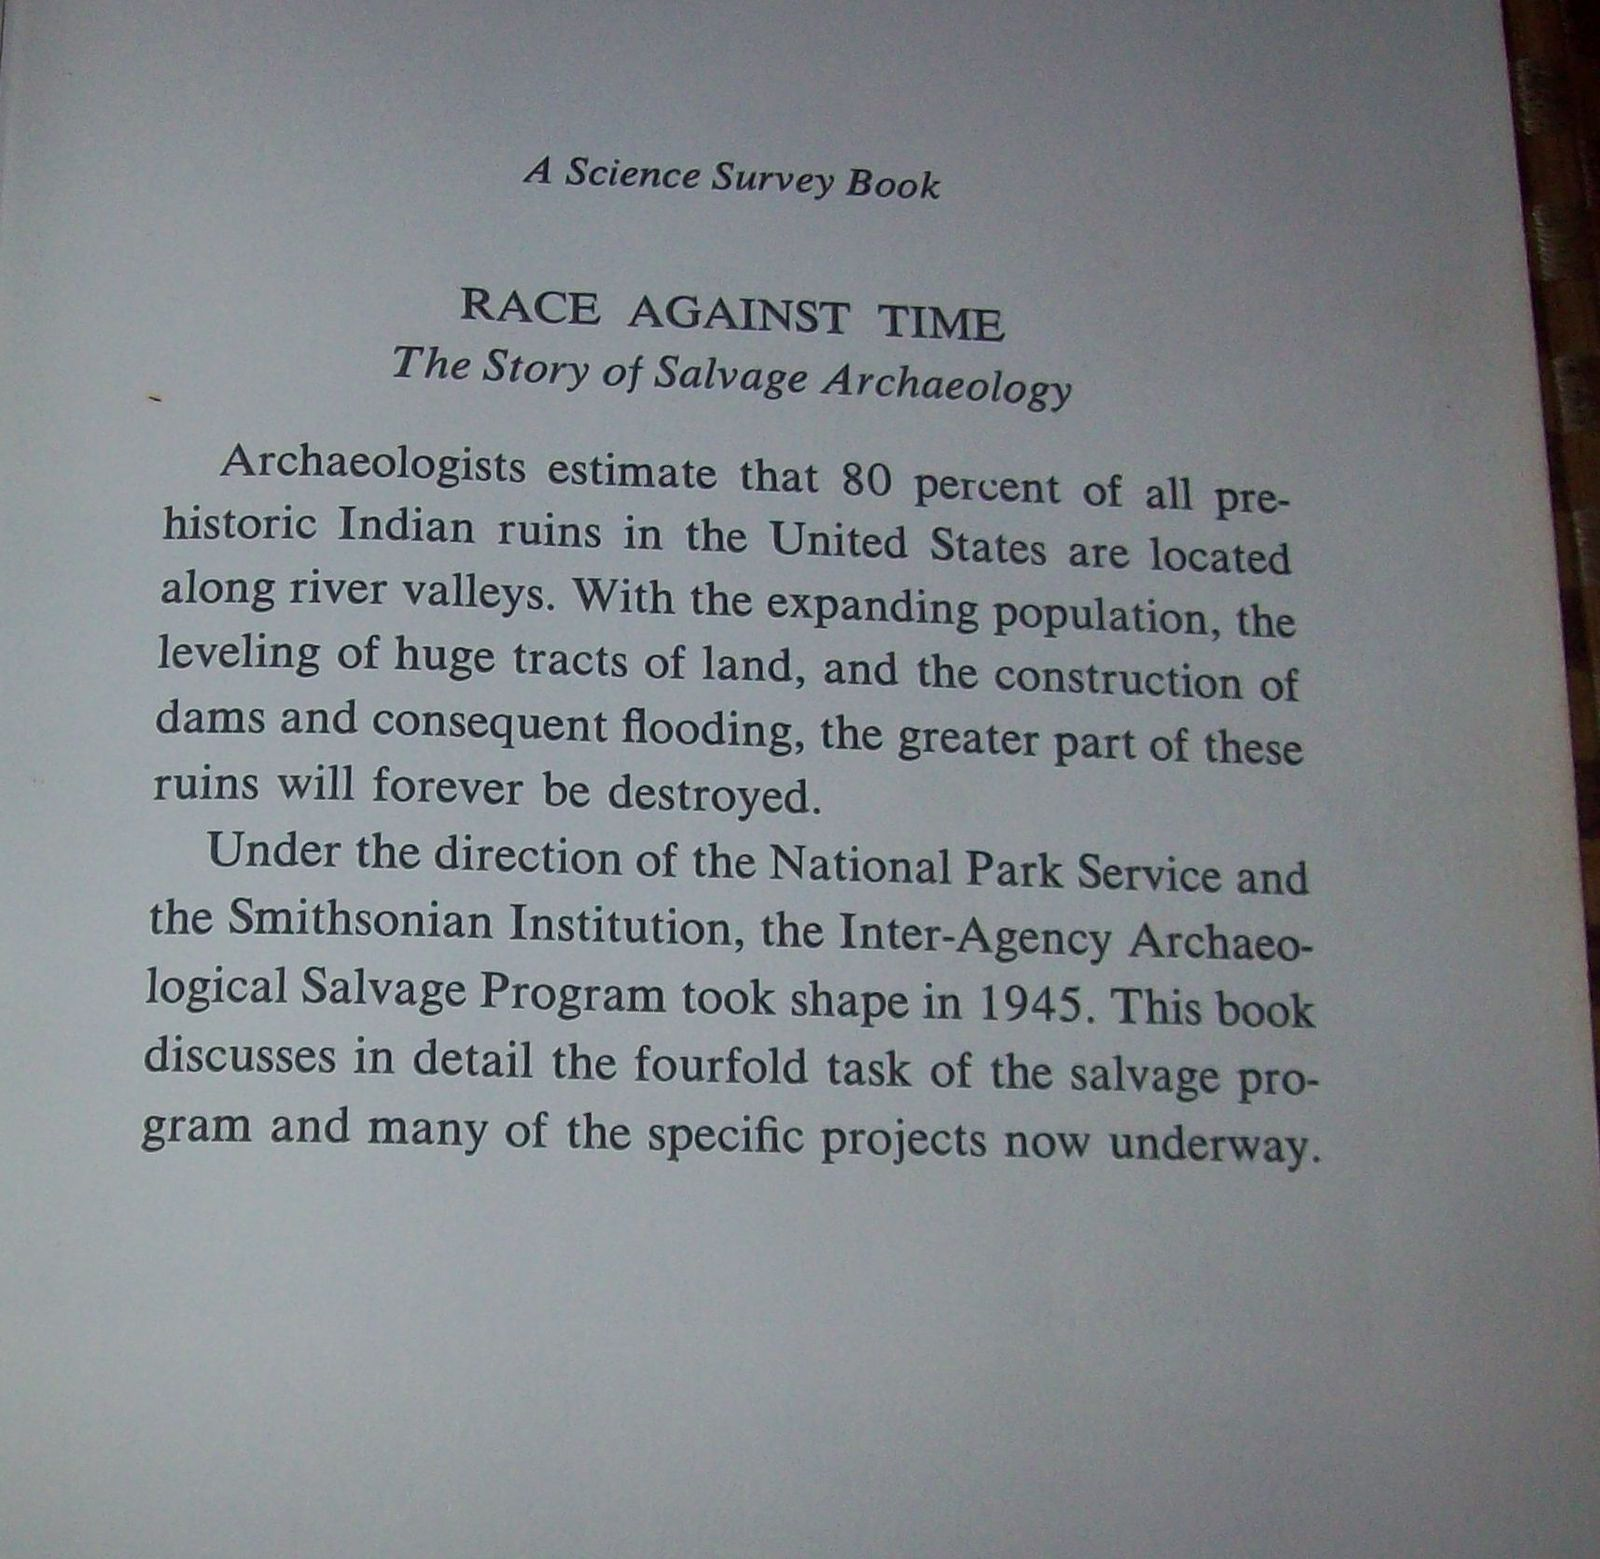 Race Against Time by Gordon C. Baldwin 1966 HBDJ Archaeology